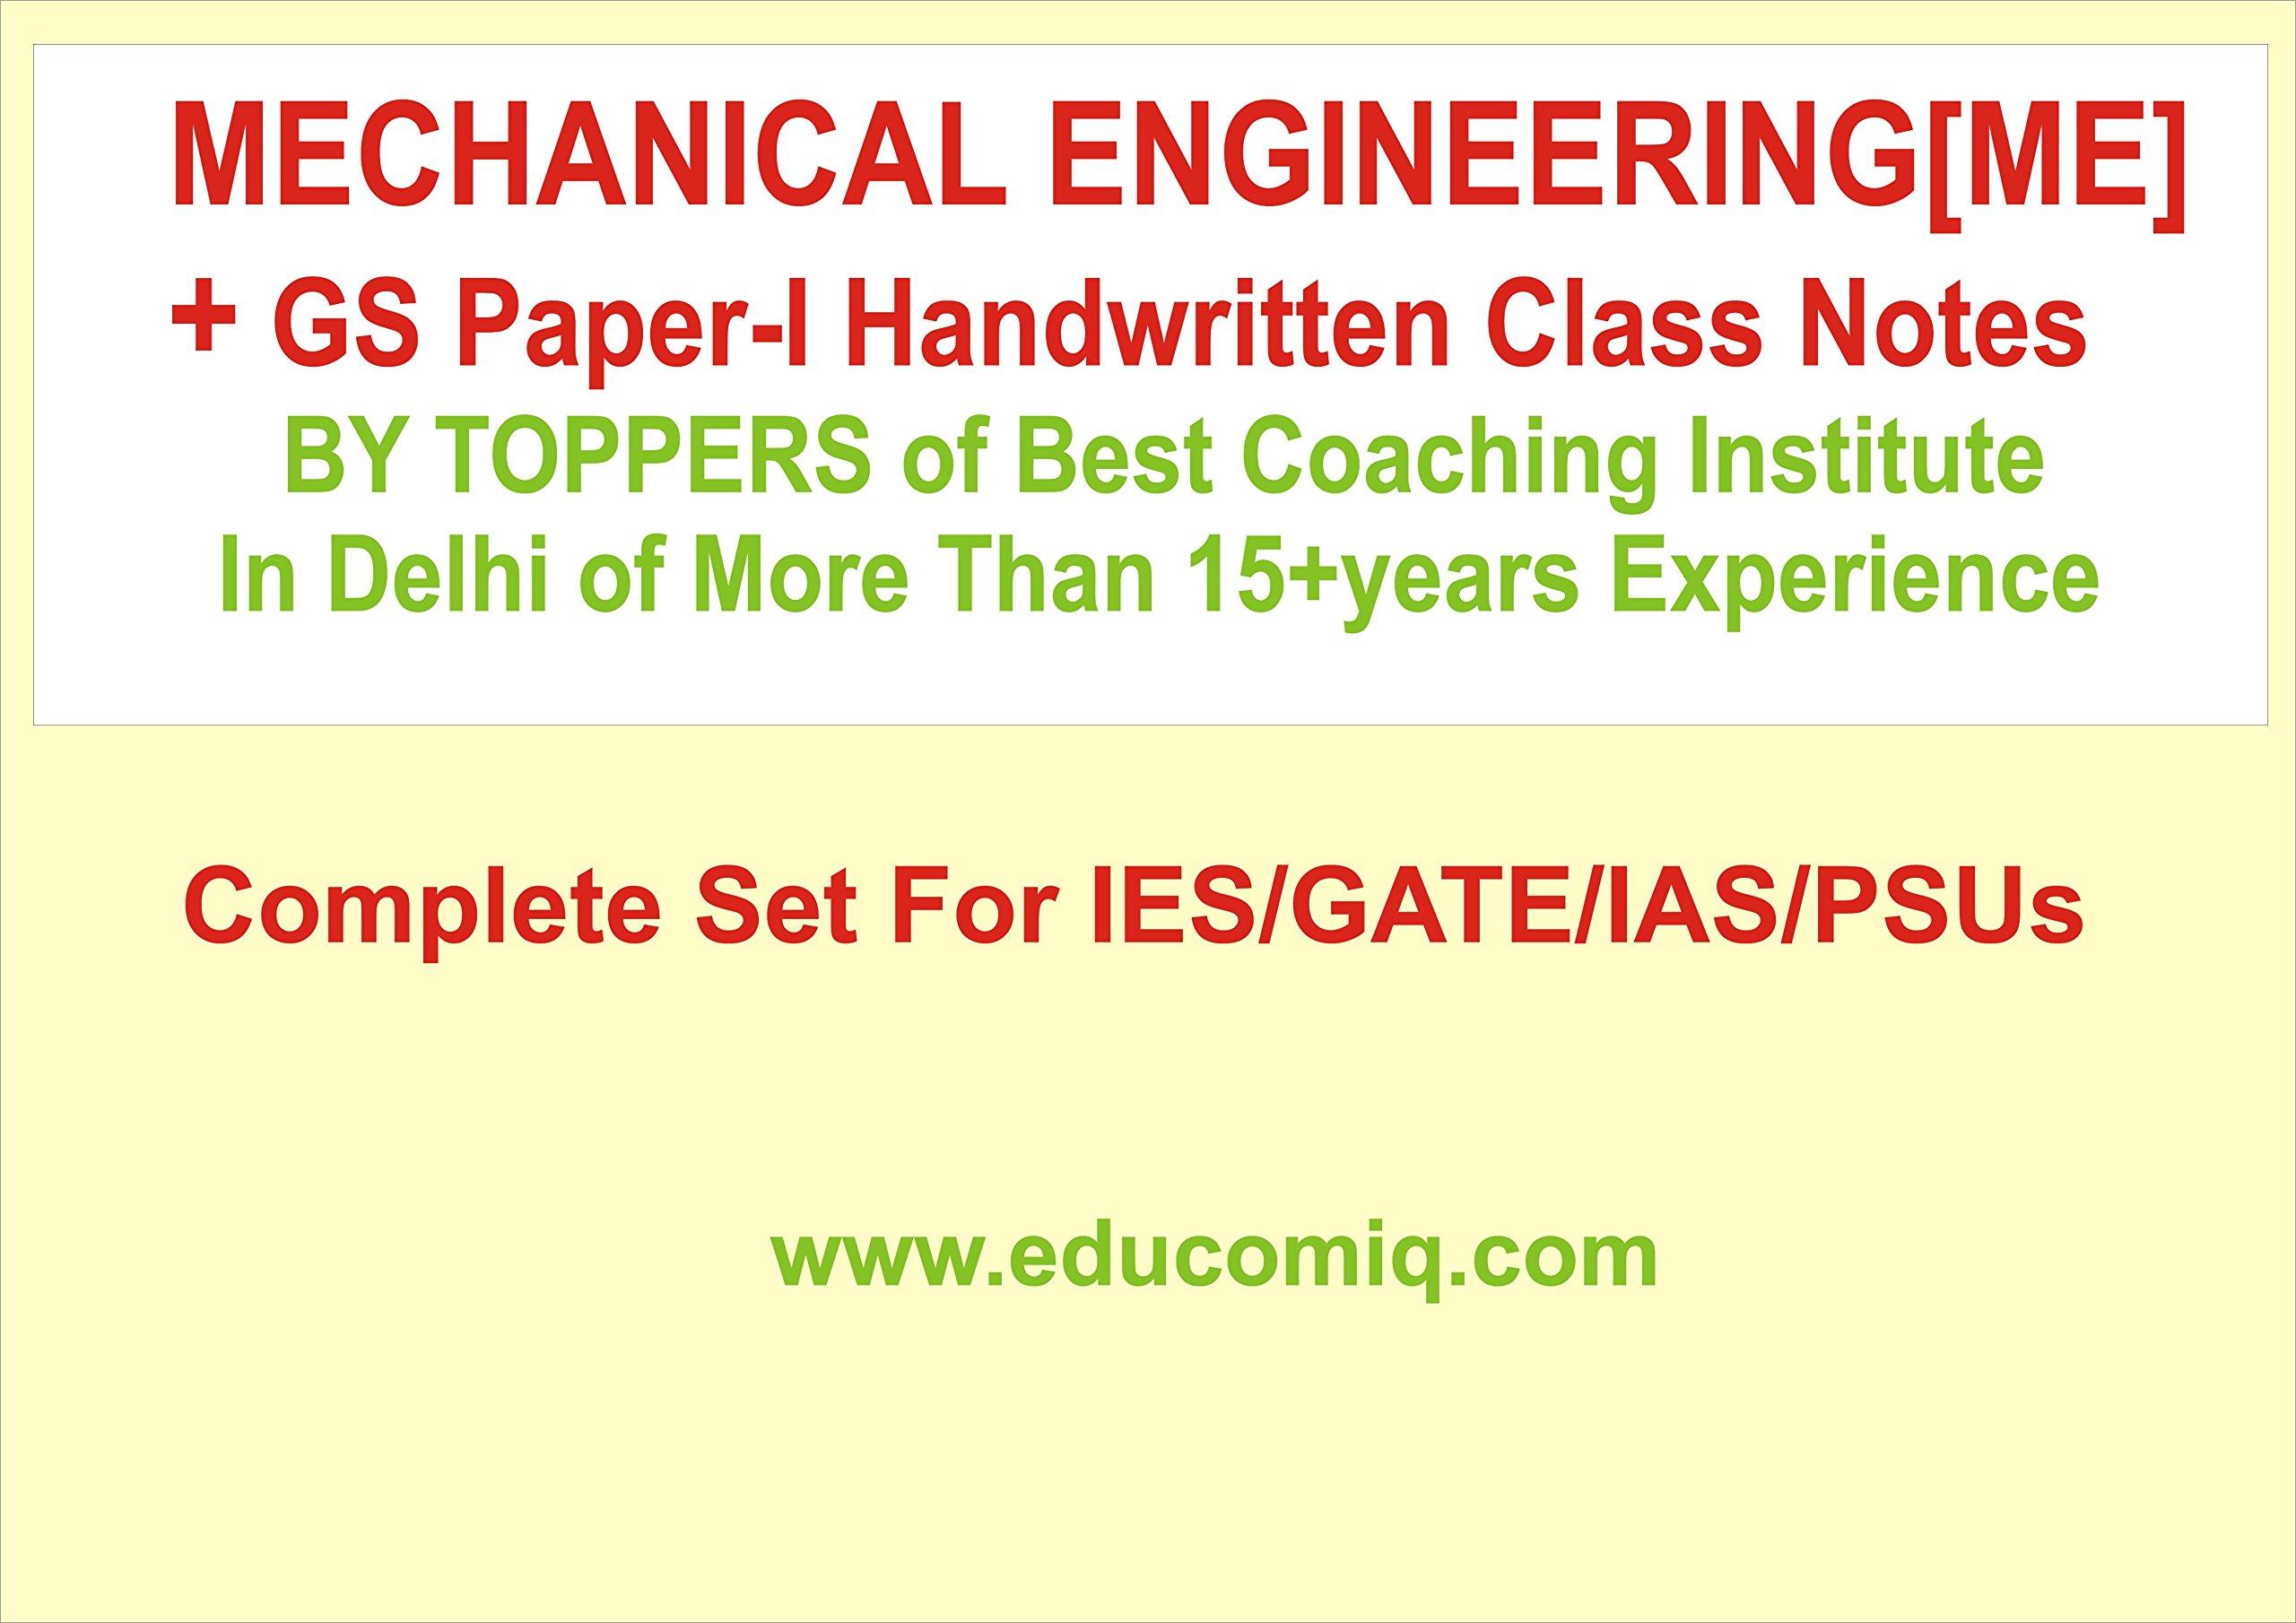 Buy [Civil Engineering + GS paper-I] Handwritten Notes [Complete SET